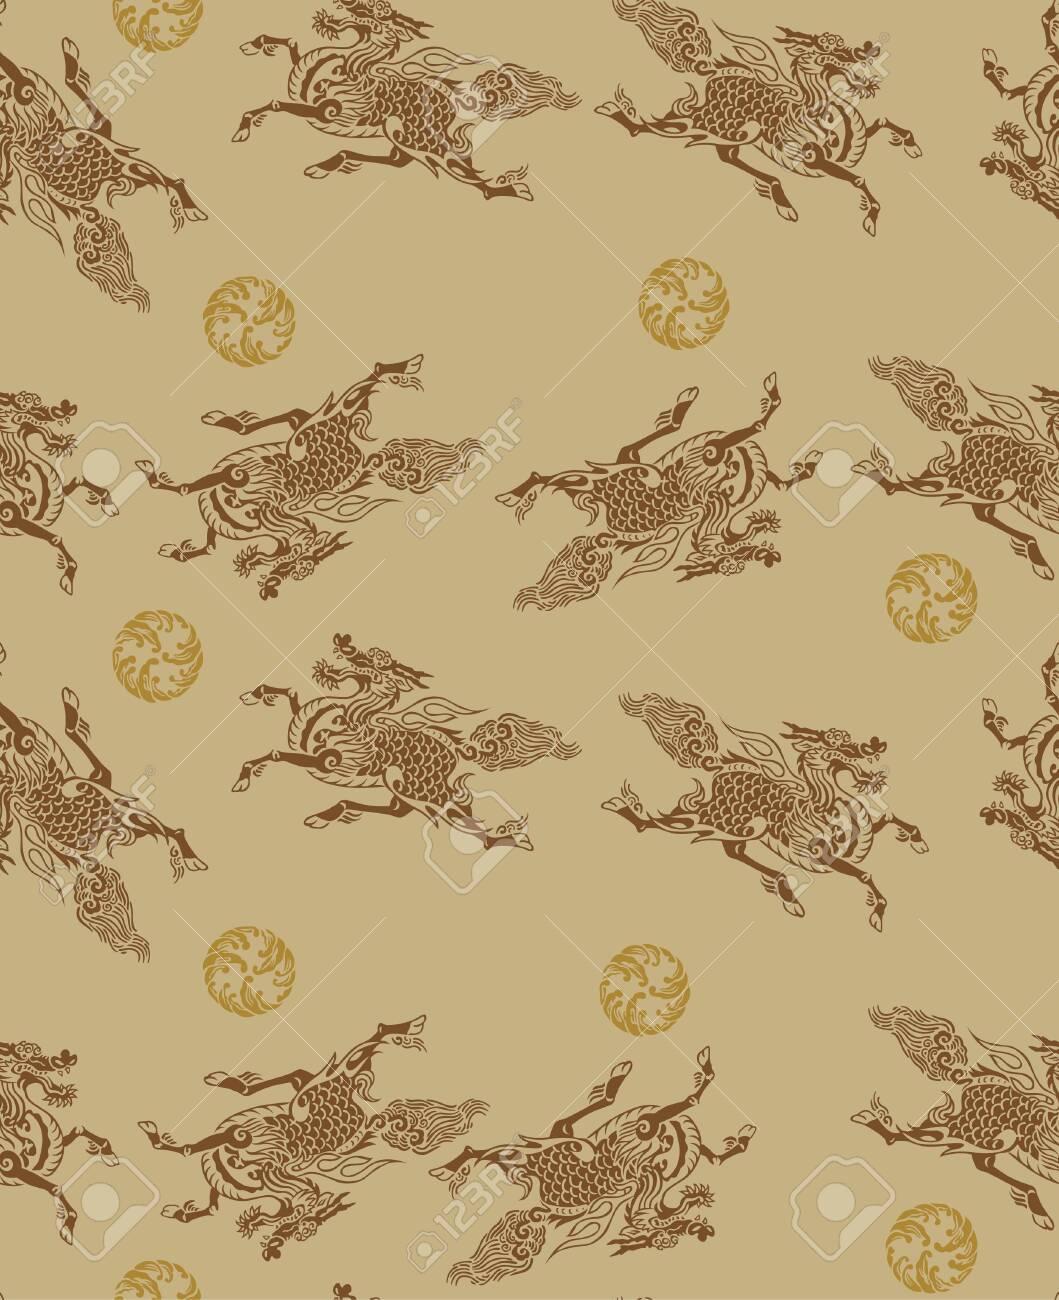 Japanese Kirin Mythical Dragon Horse Seamless Pattern - 132286164